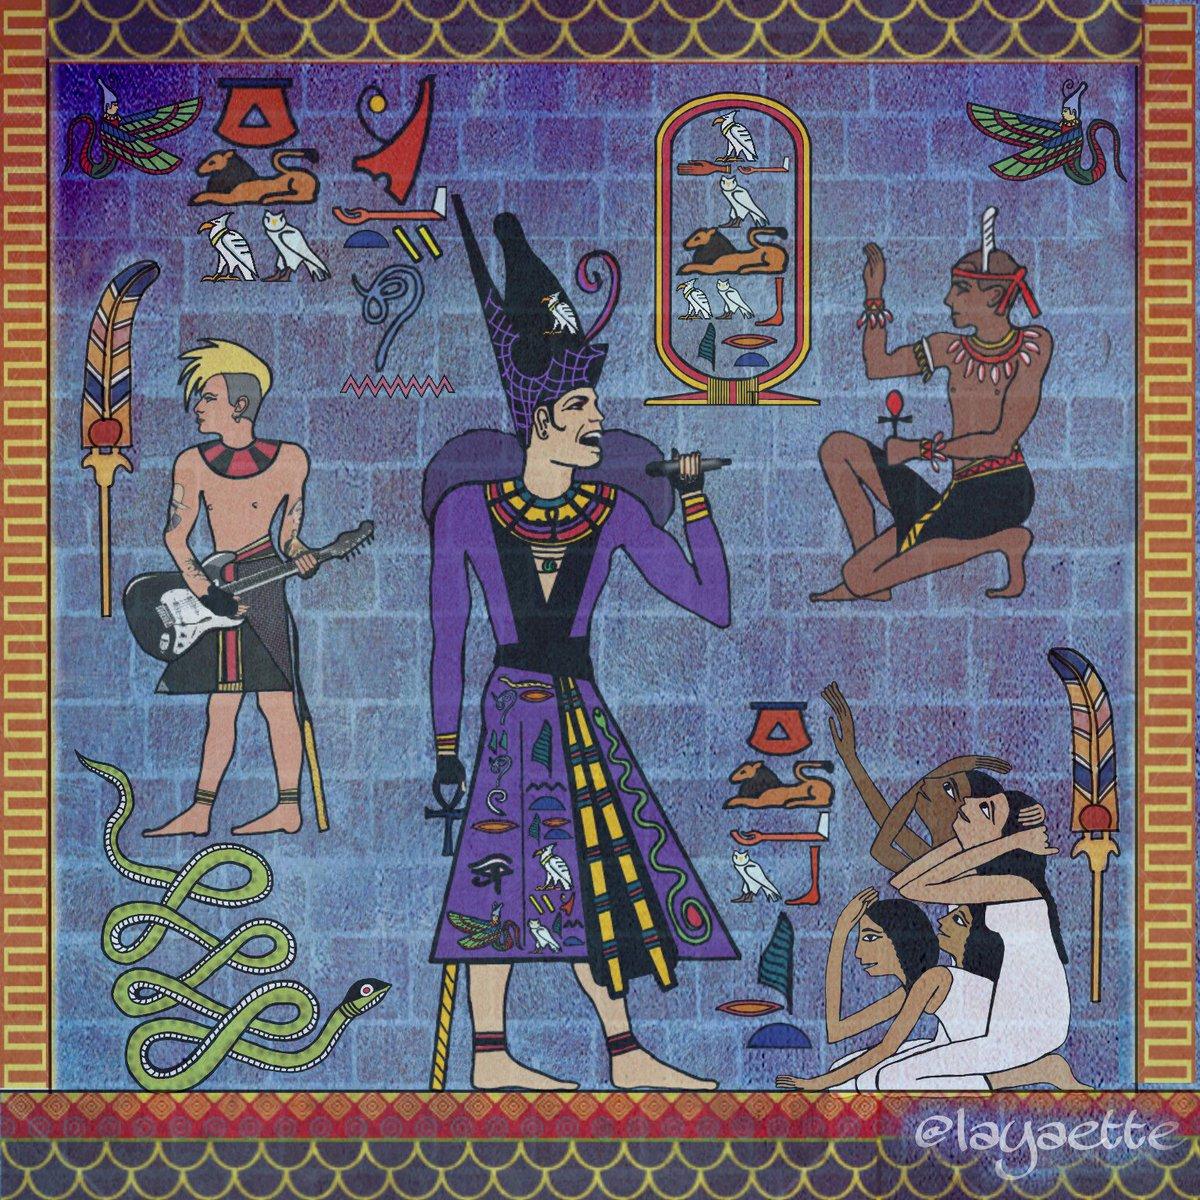 My wall for your Entertainment #glamberts #adamlambert #fanart #foryourentertainment #glamnation #heiroglyphics #Egyptian #style @adamlambert @LoveMrSpencer @TommyJoeRatliff<br>http://pic.twitter.com/ylnr5tOfqA